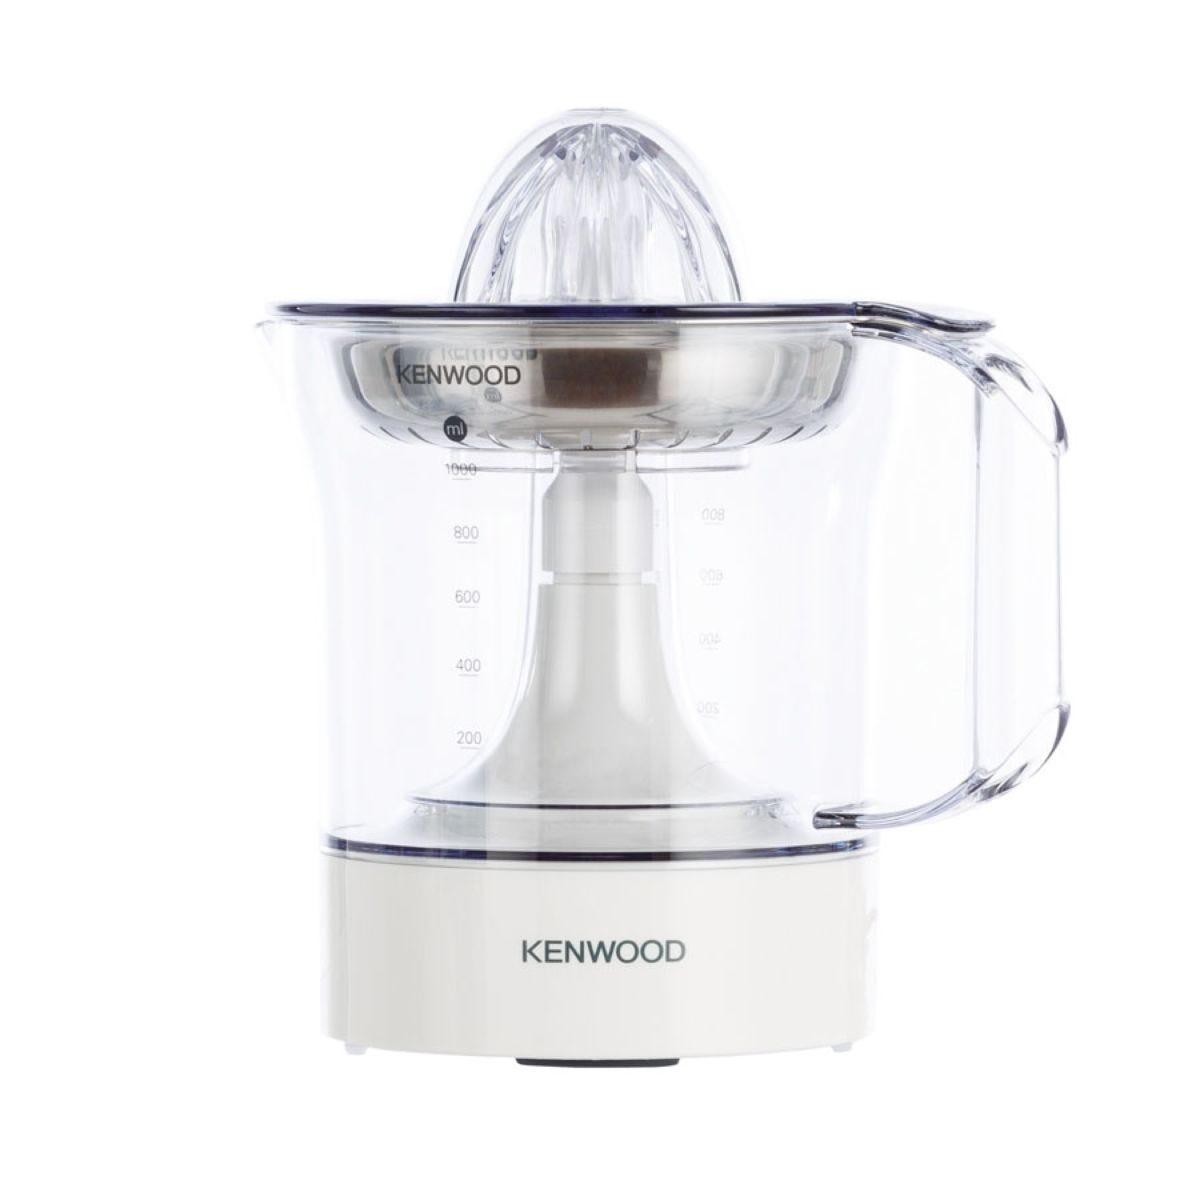 Kenwood JE290 Citrus Juicer with 40W